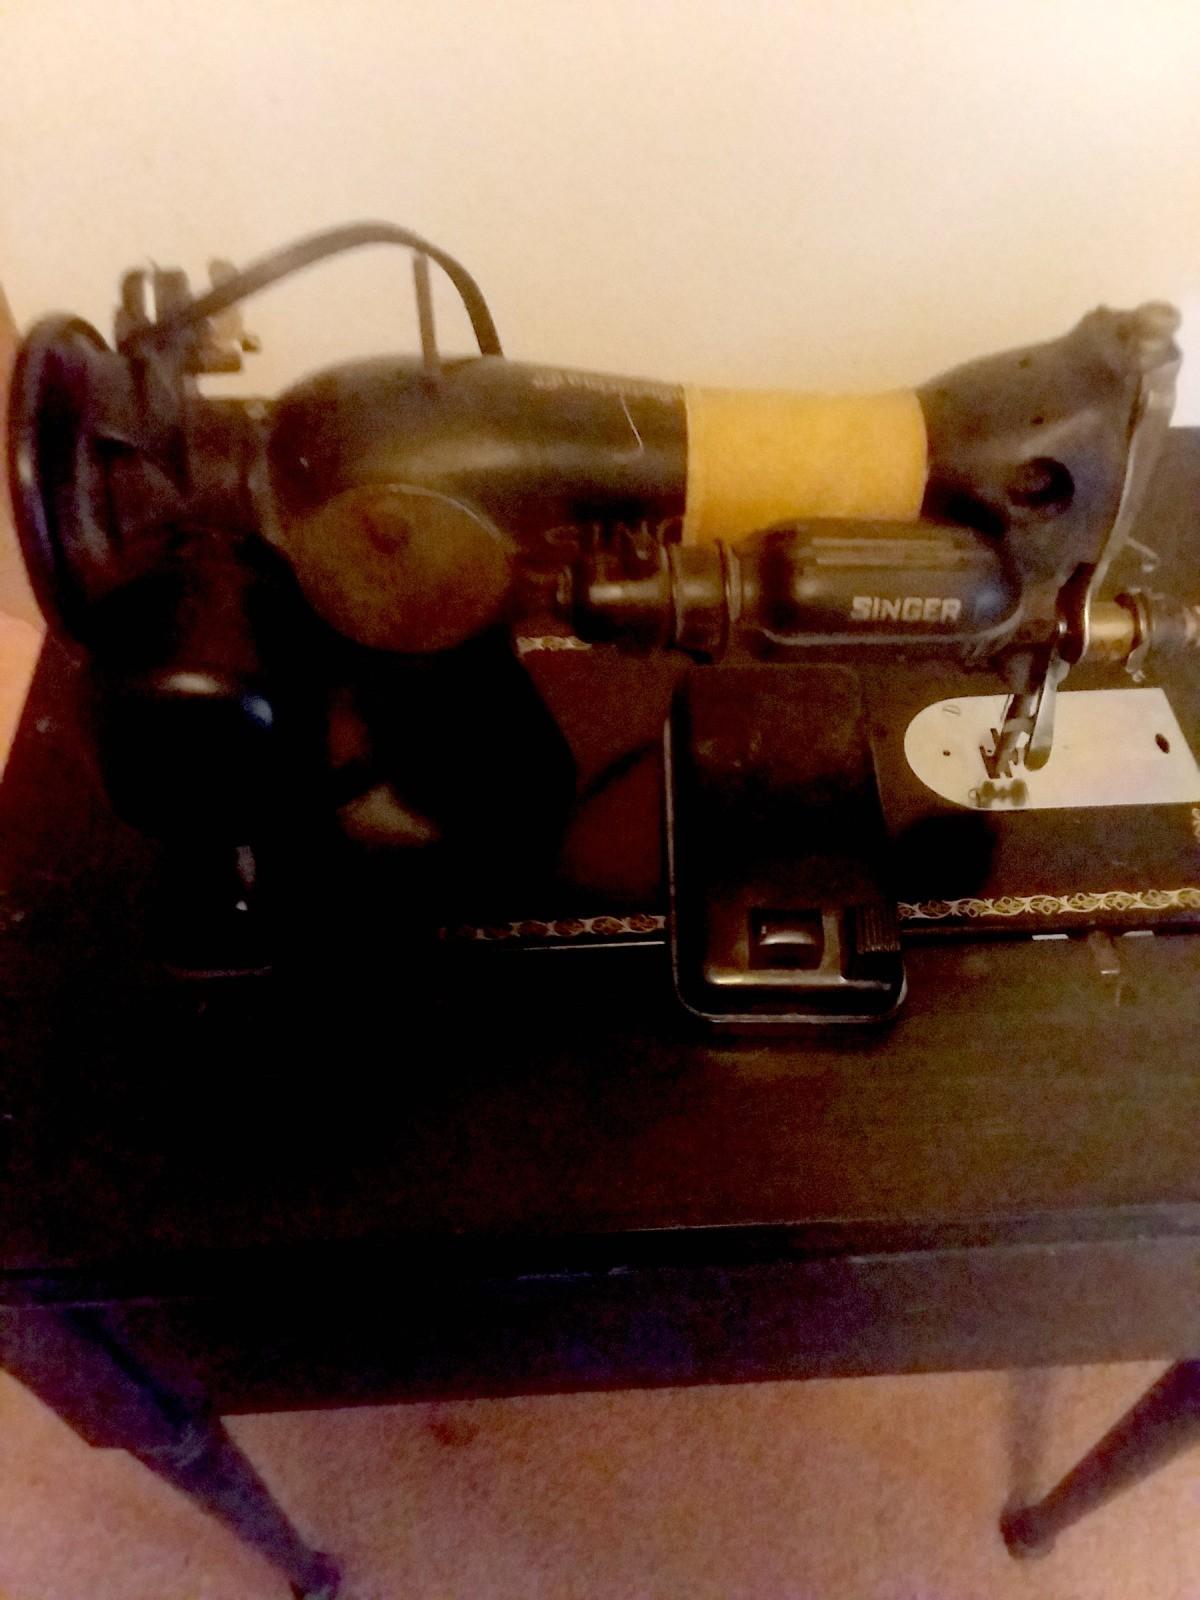 Value of a Vintage Singer Sewing Machine?   ThriftyFun